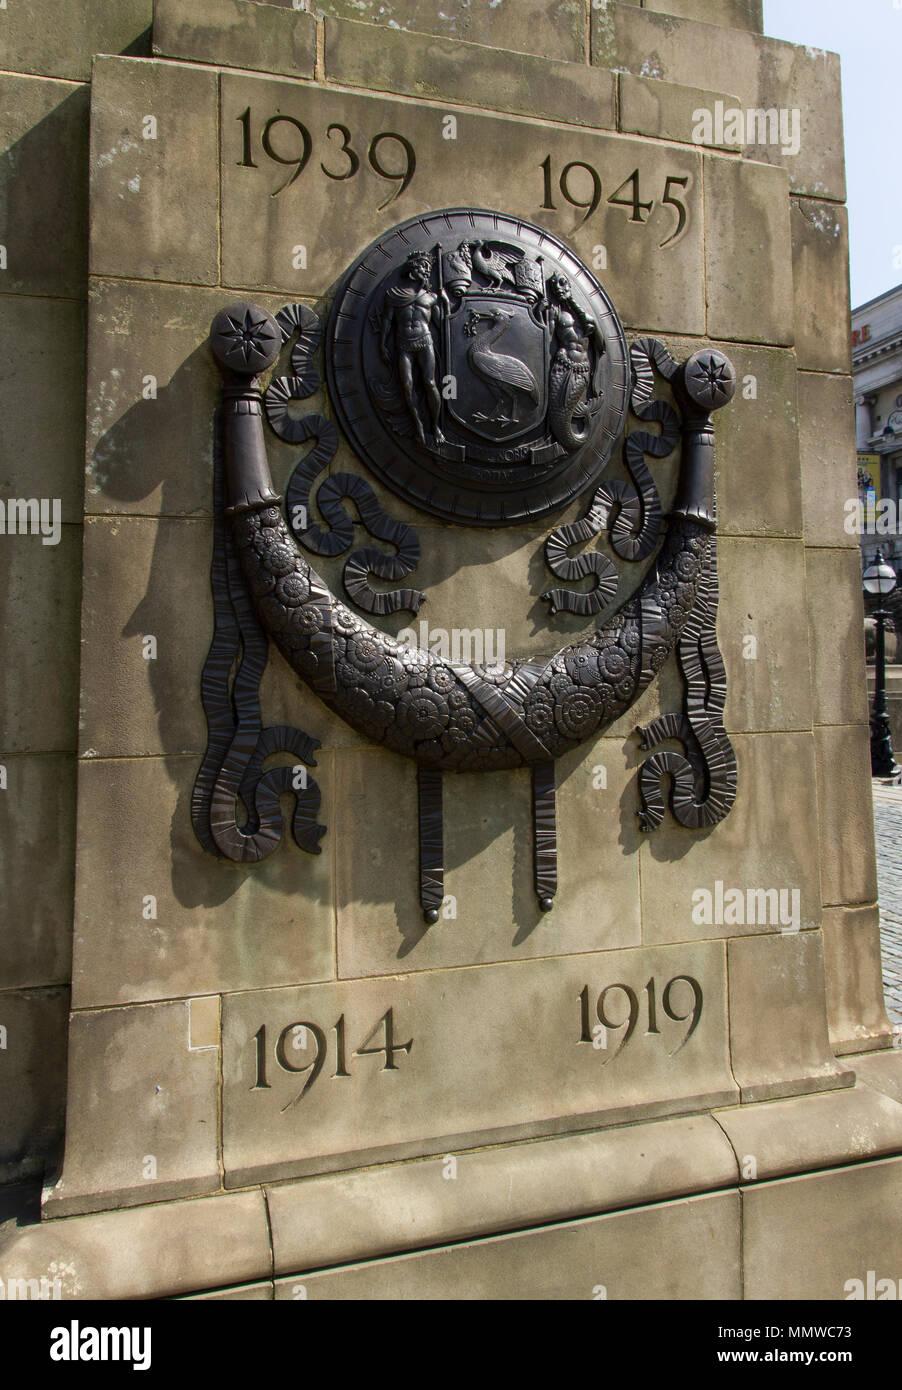 War memorial 1914-19 and 1939-1945, Liverpool - Stock Image